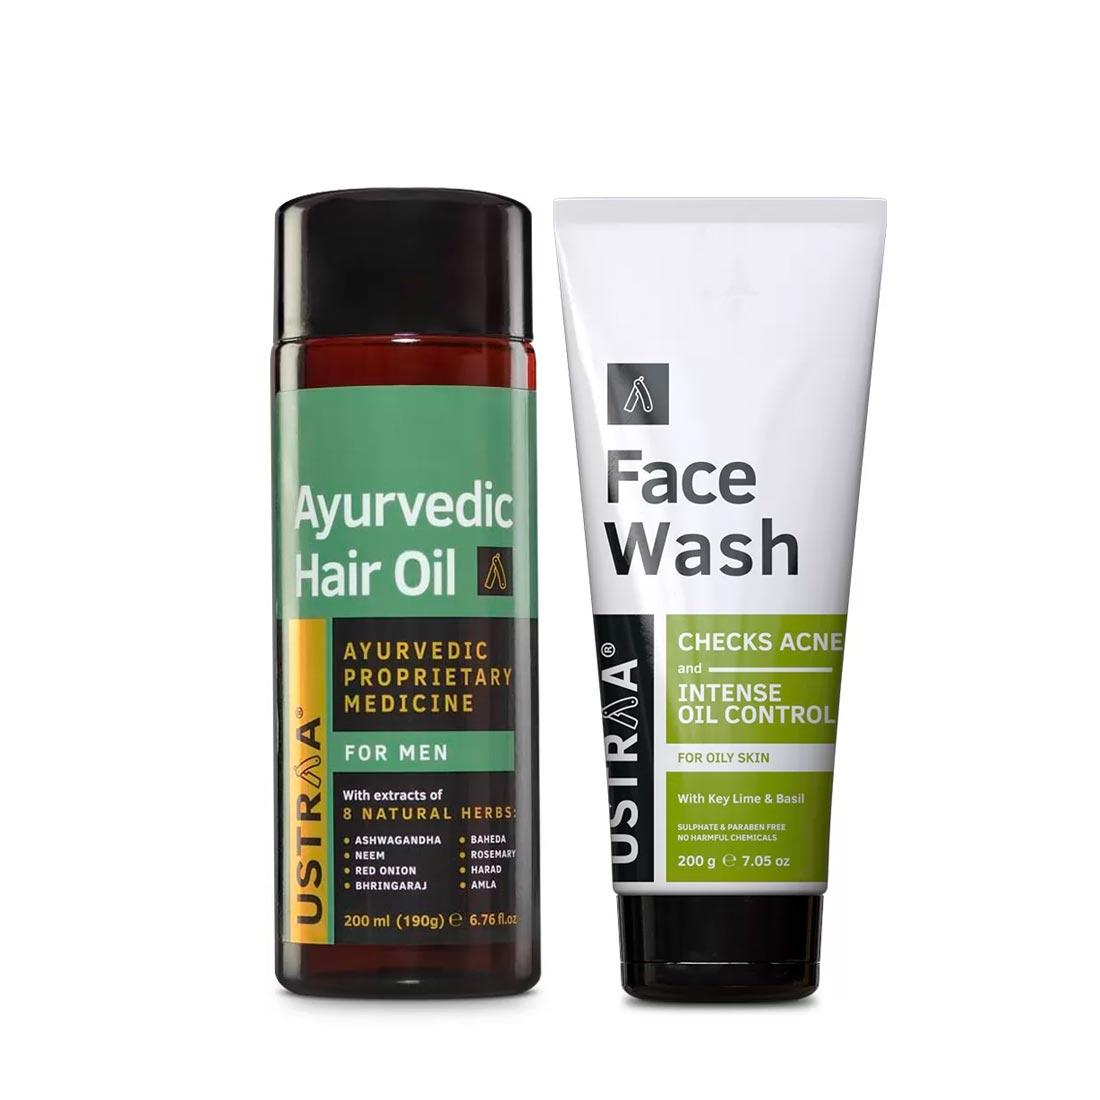 Ustraa | Ustraa Ayurvedic Hair Oil 200 ml and Face Wash Oily Skin 200 g